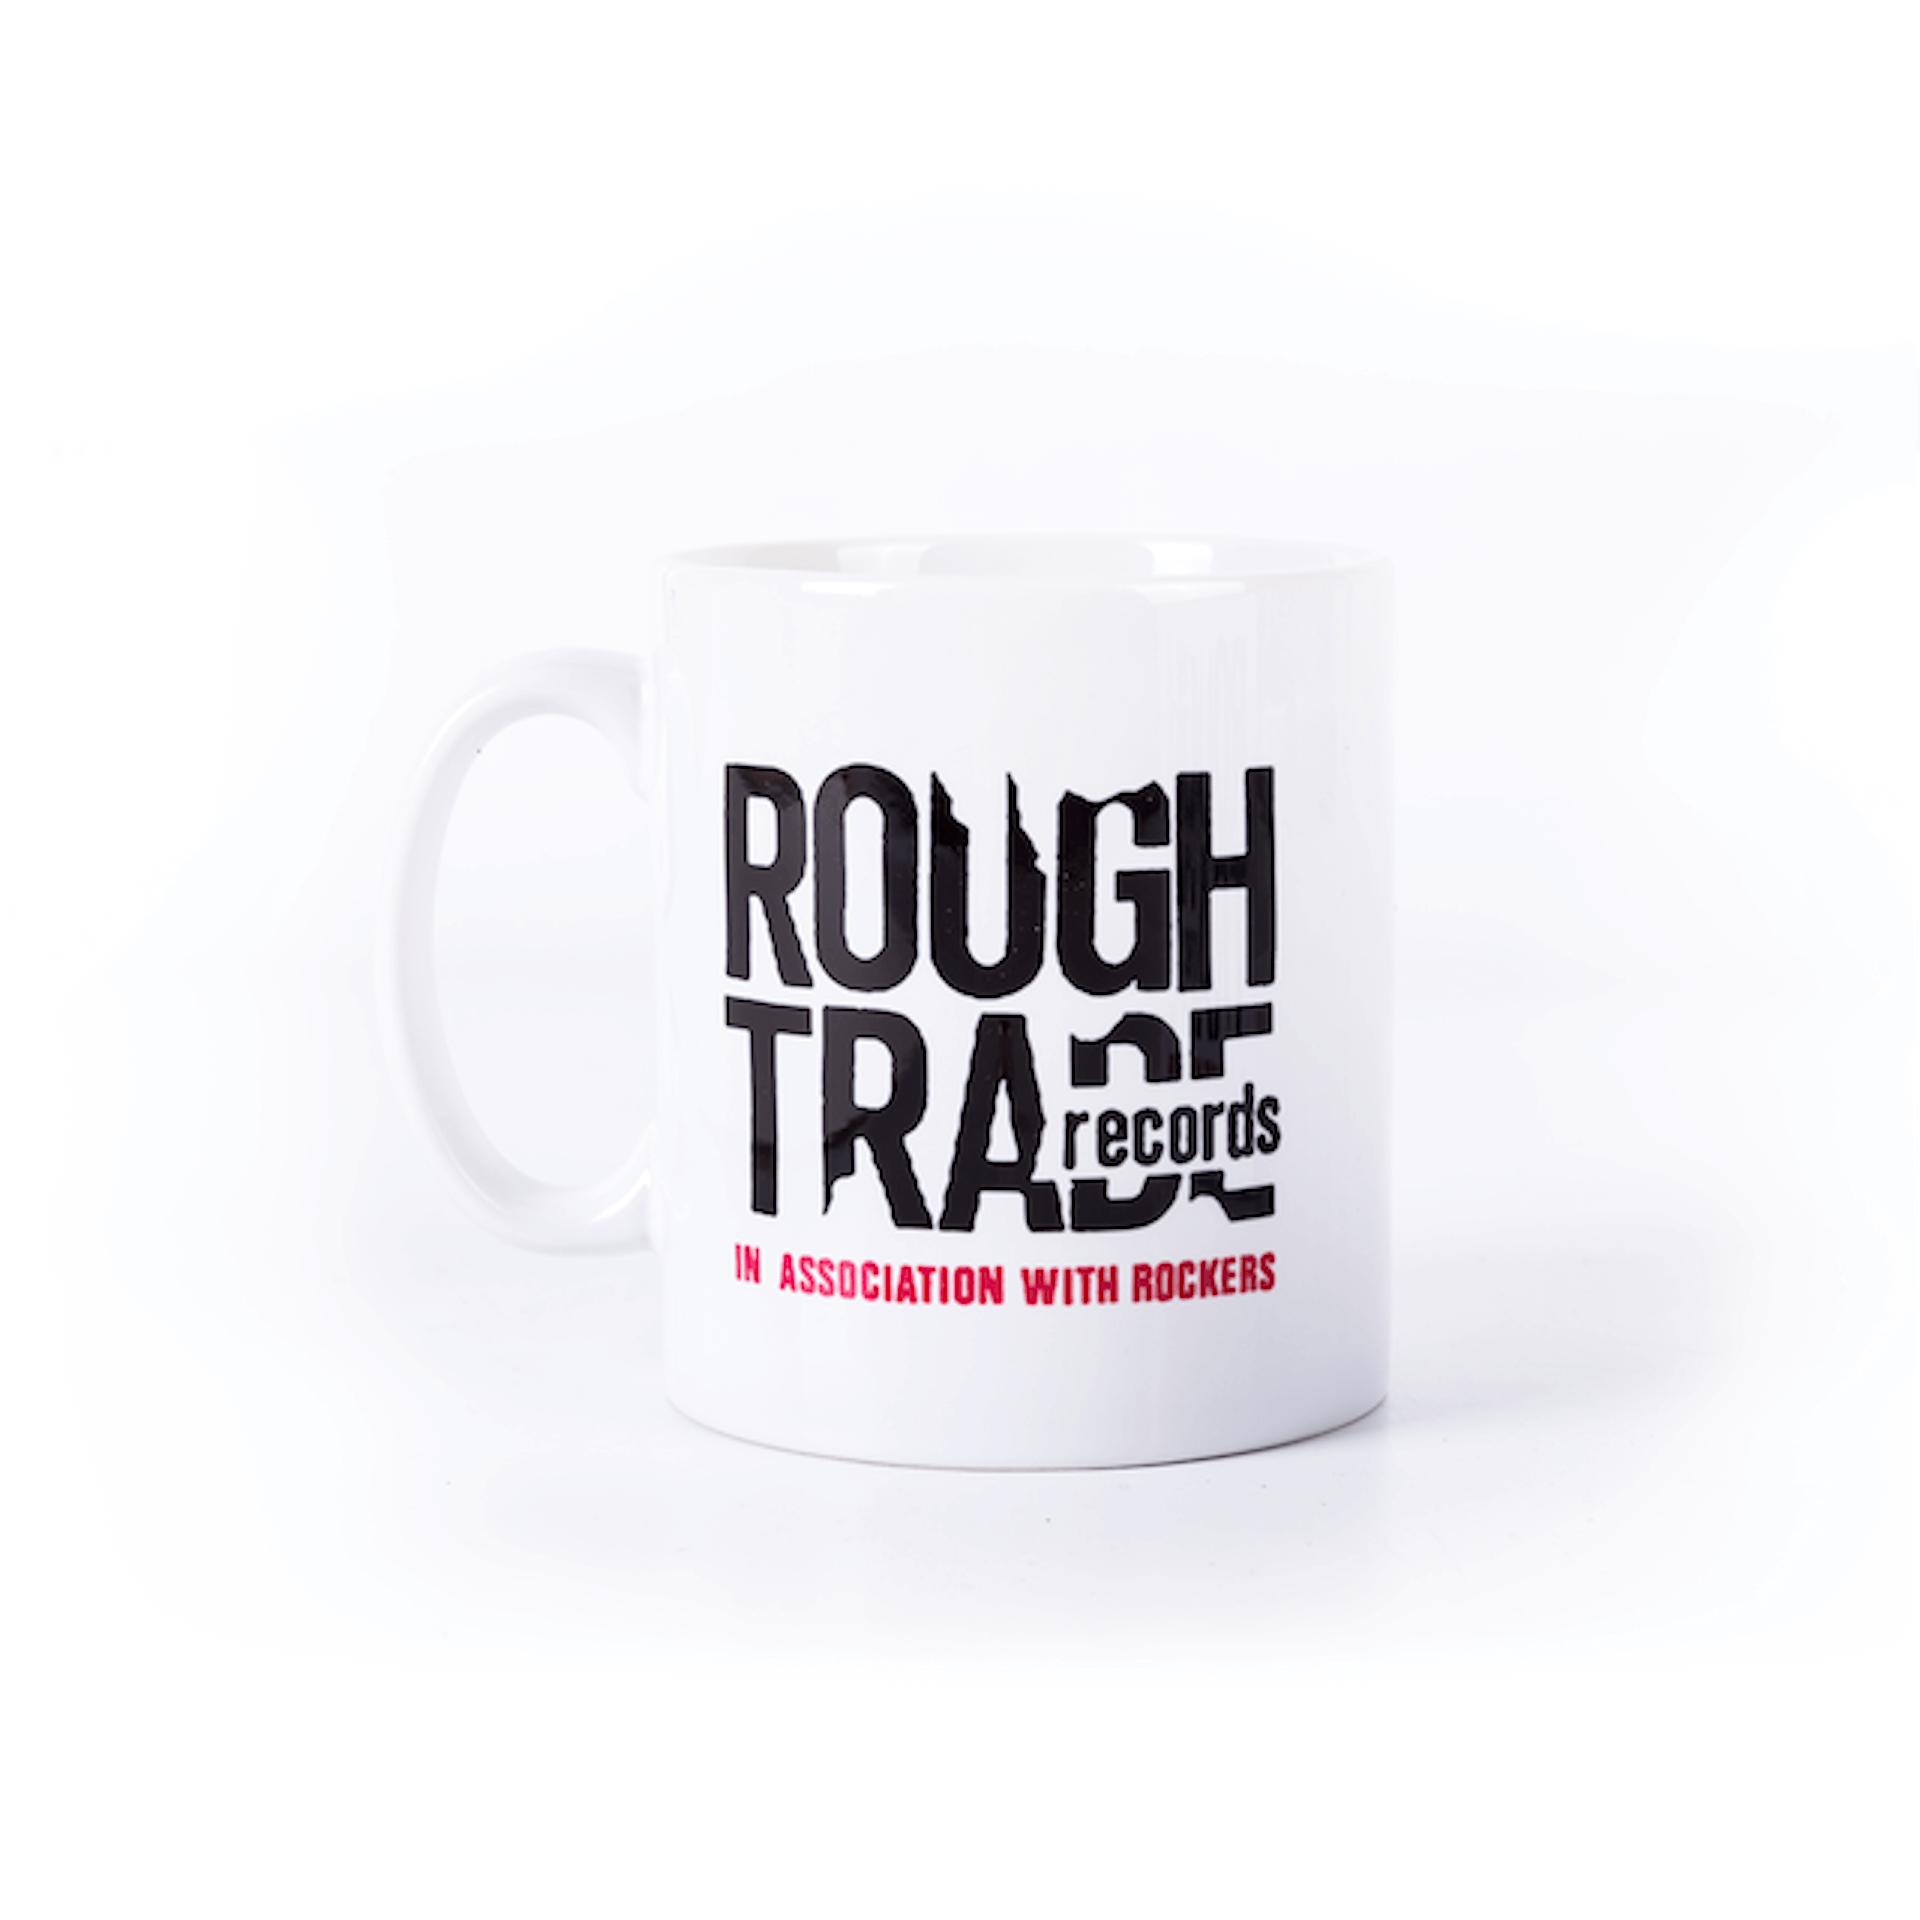 〈Rough Trade Records〉の特別展示が代官山蔦屋書店にて開催決定!ジェフ・トラヴィスが選んだ名盤など展示&新作グッズも販売 music201015_roughtrade-tsite_1-1920x1920